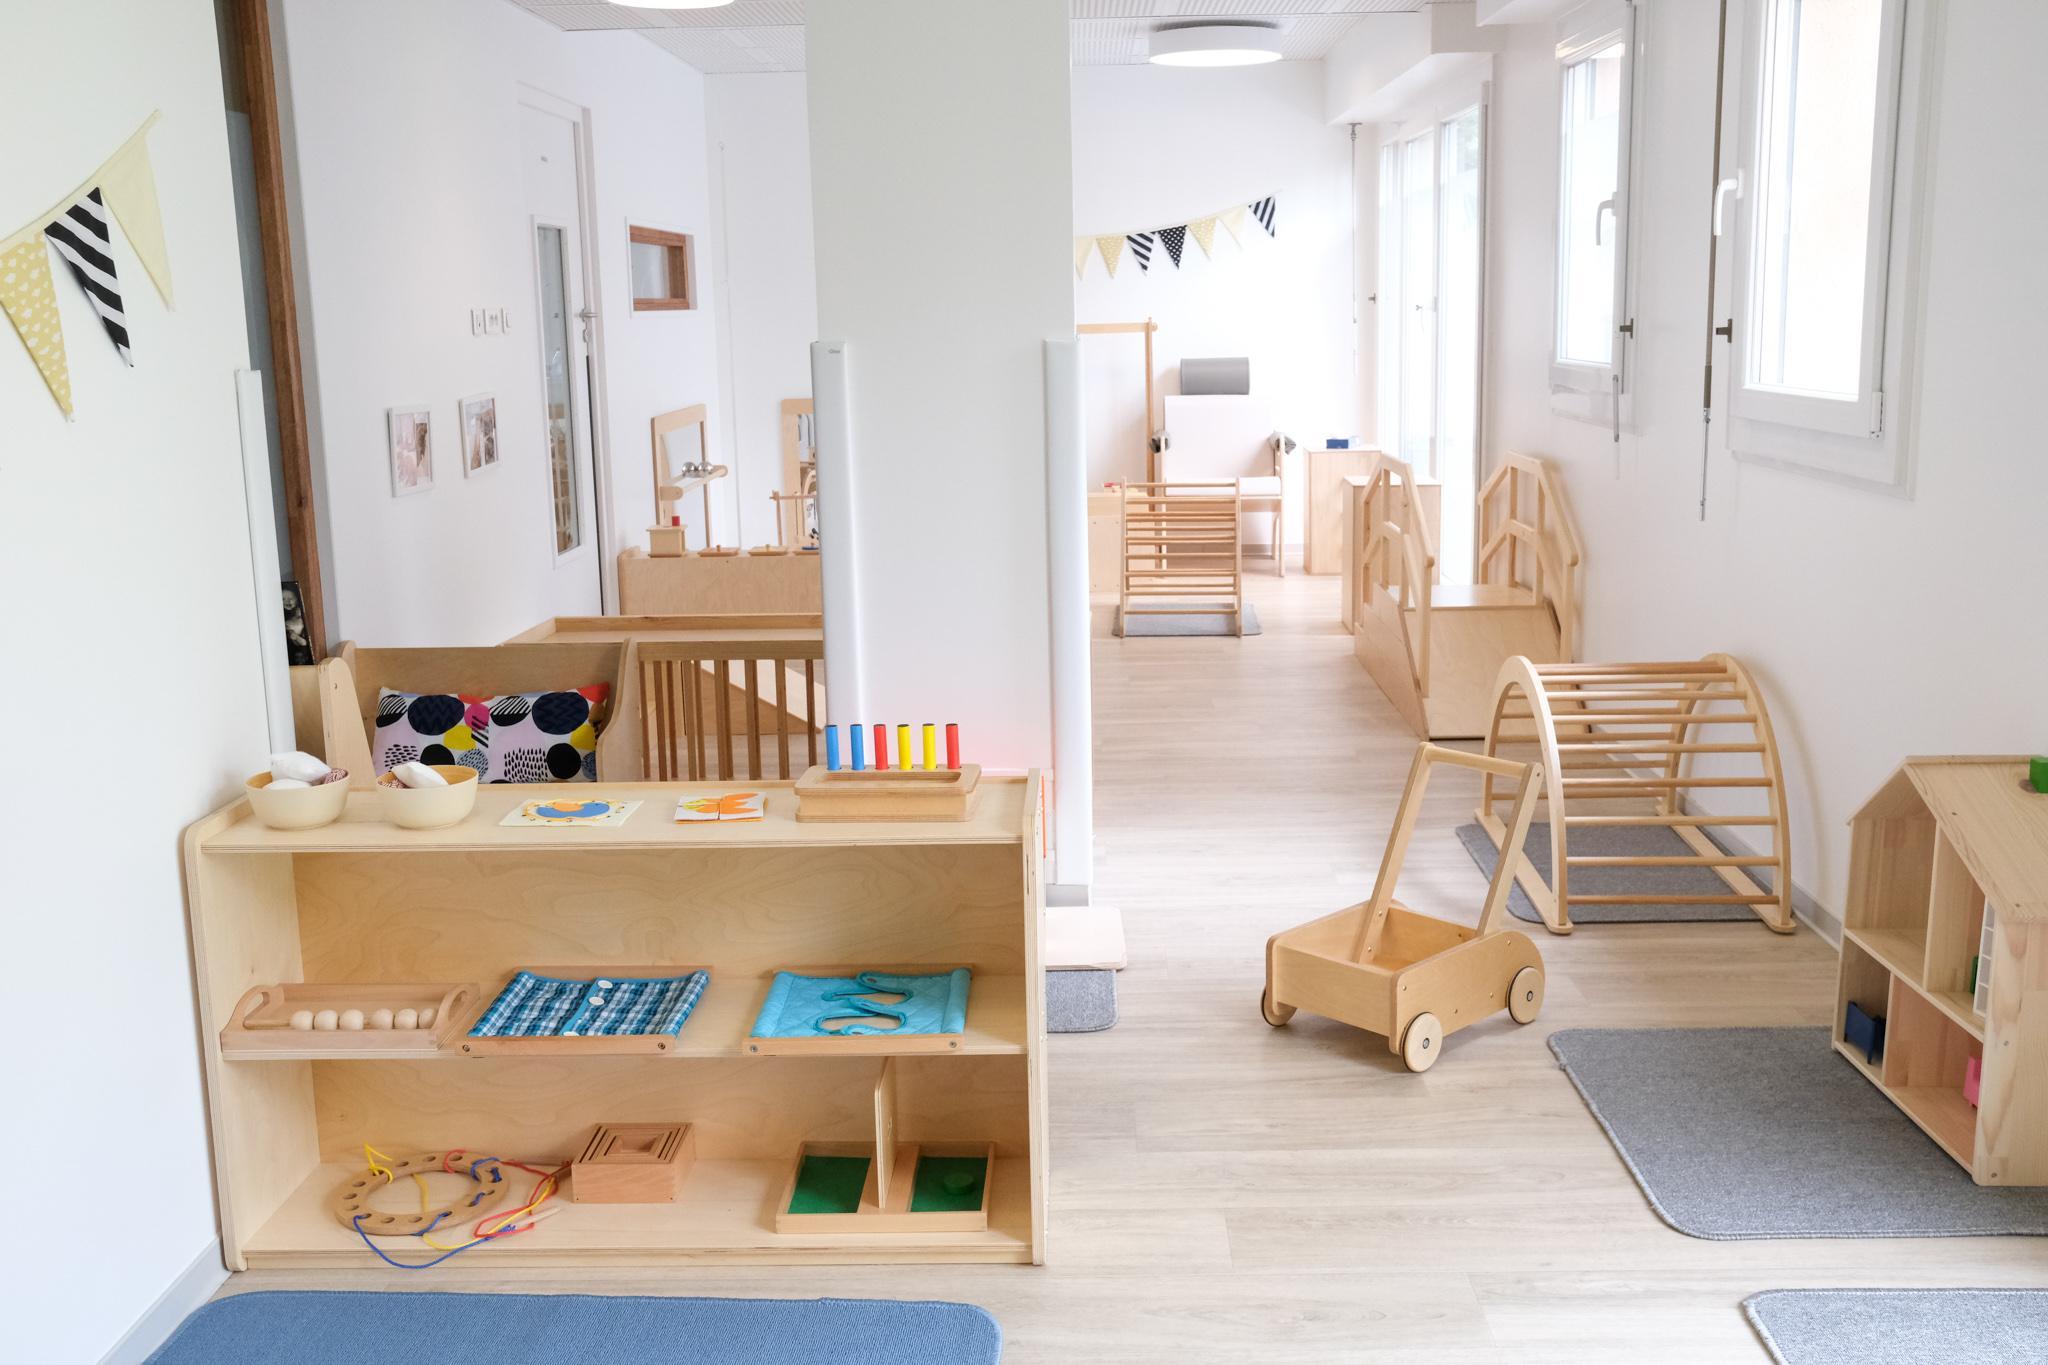 Montessori kinderdagverblijven in België